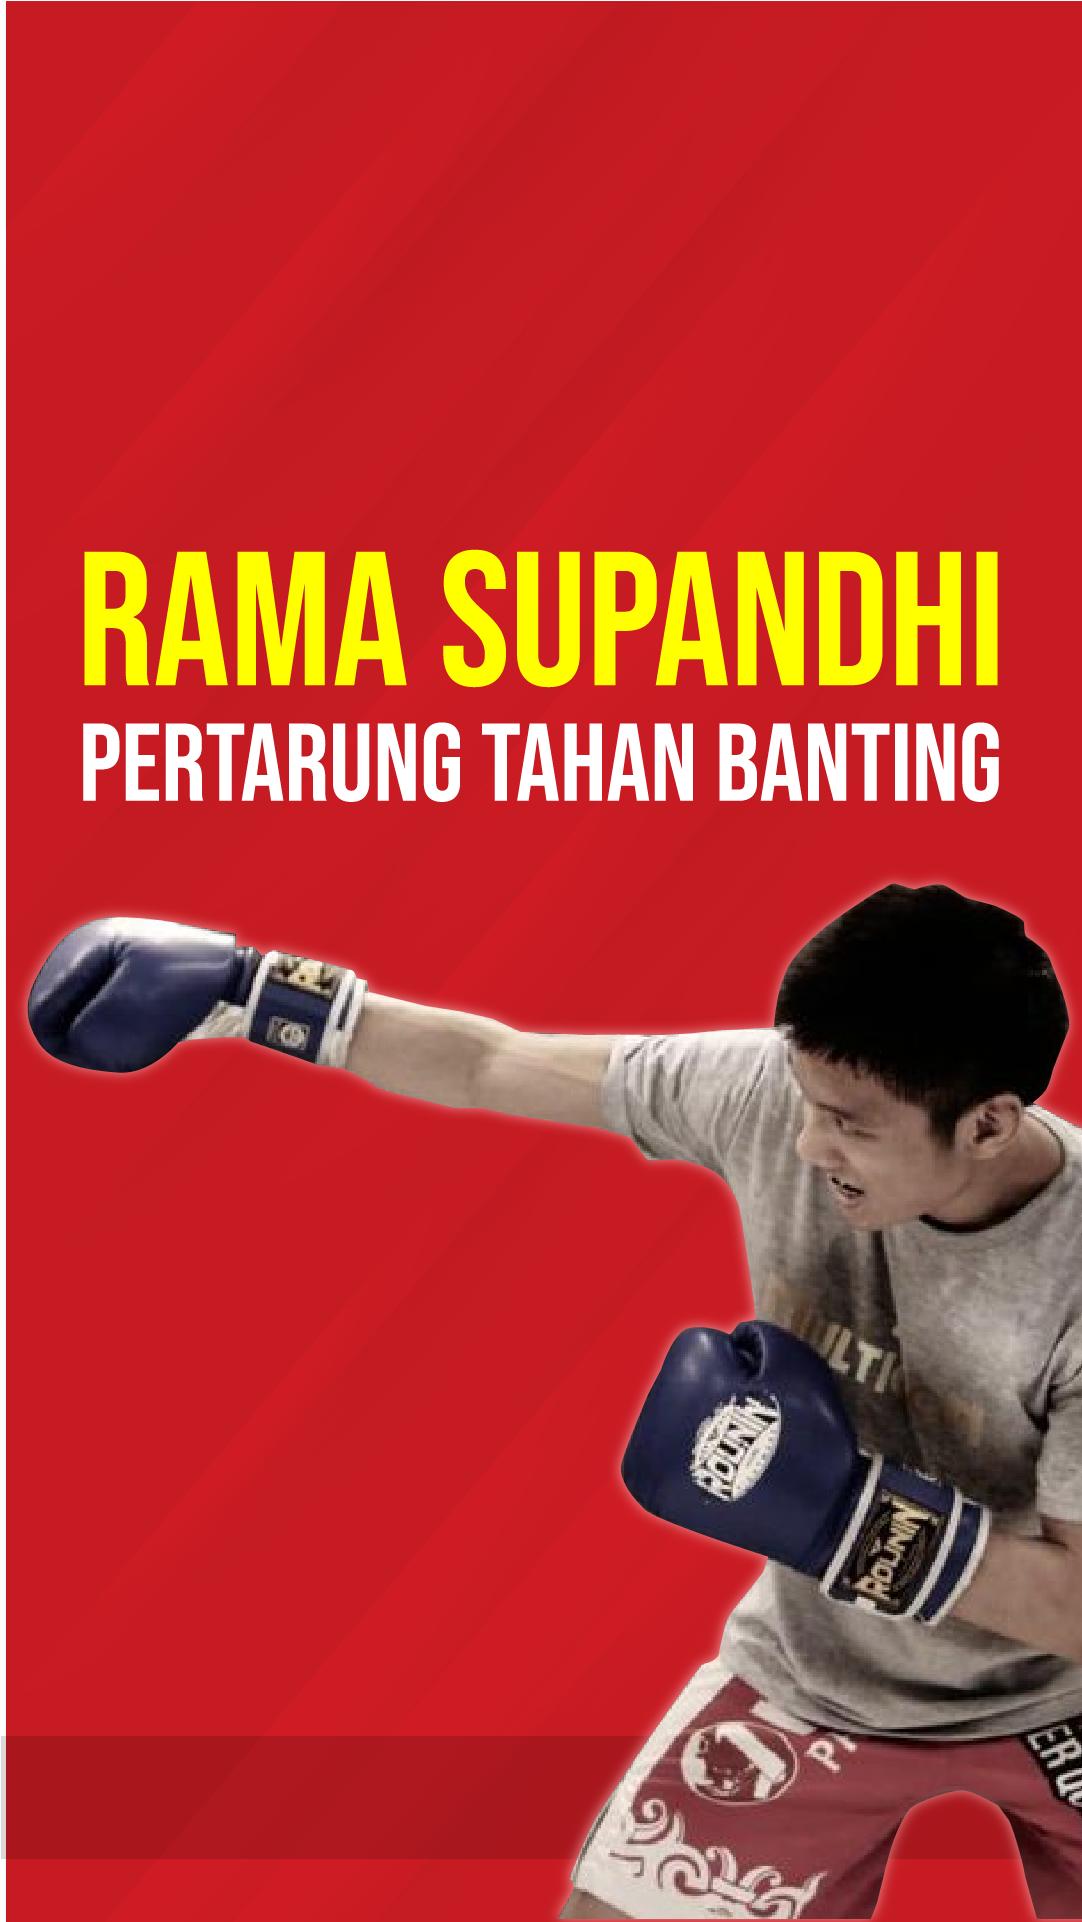 Rama Supandhi Petarung Tahan Banting Banting Movies Tips